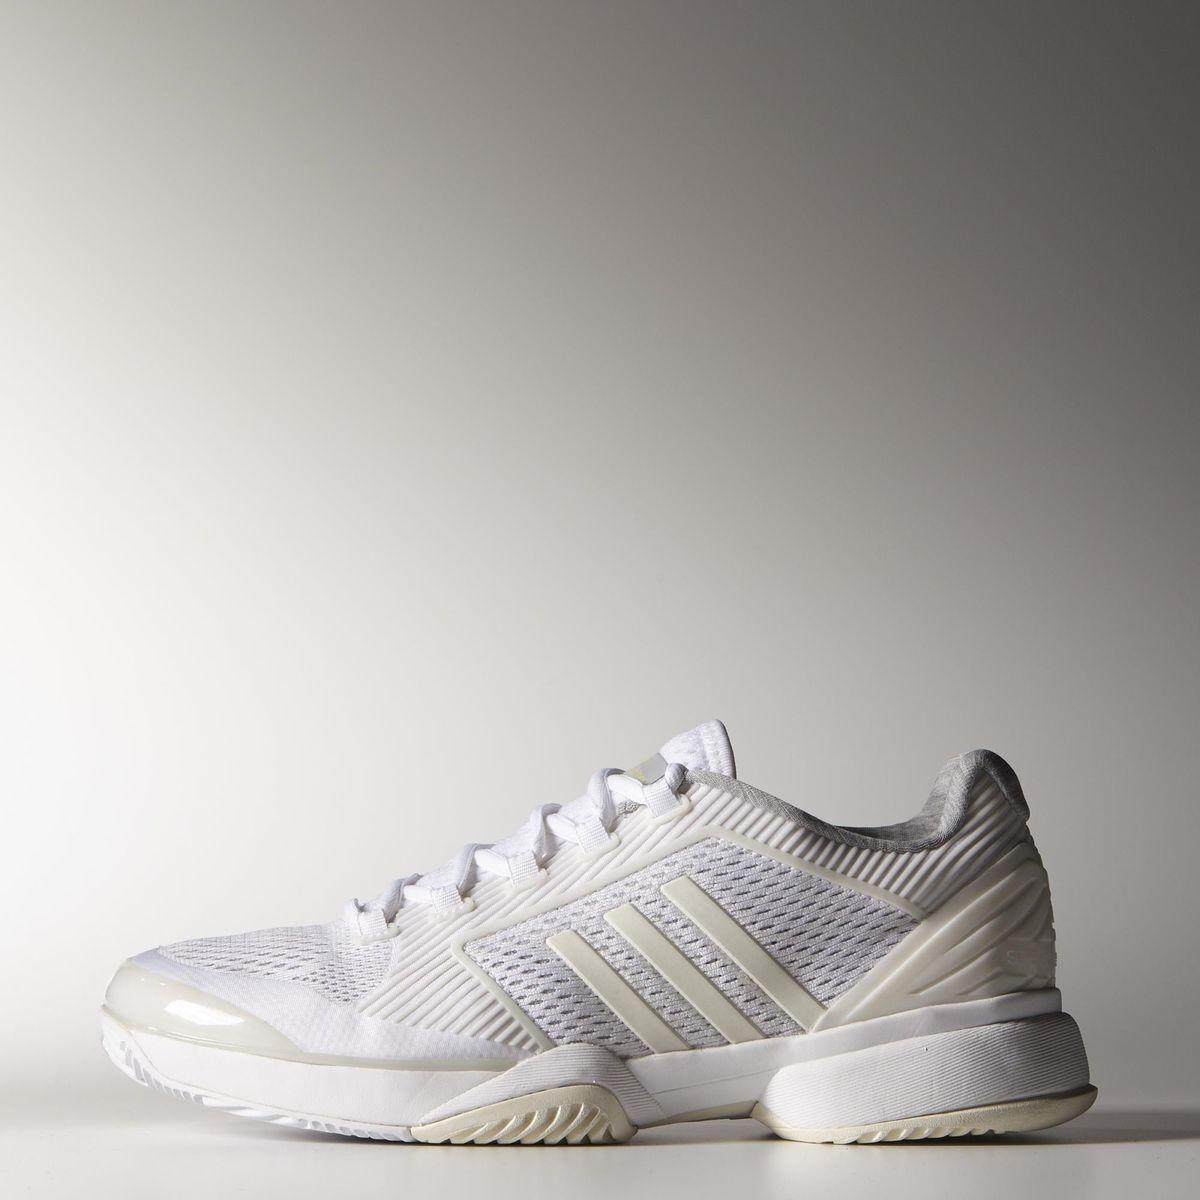 0e9807cd83152 Adidas Womens Stella McCartney Barricade 2015 Tennis Shoes - White/Yellow -  Tennisnuts.com